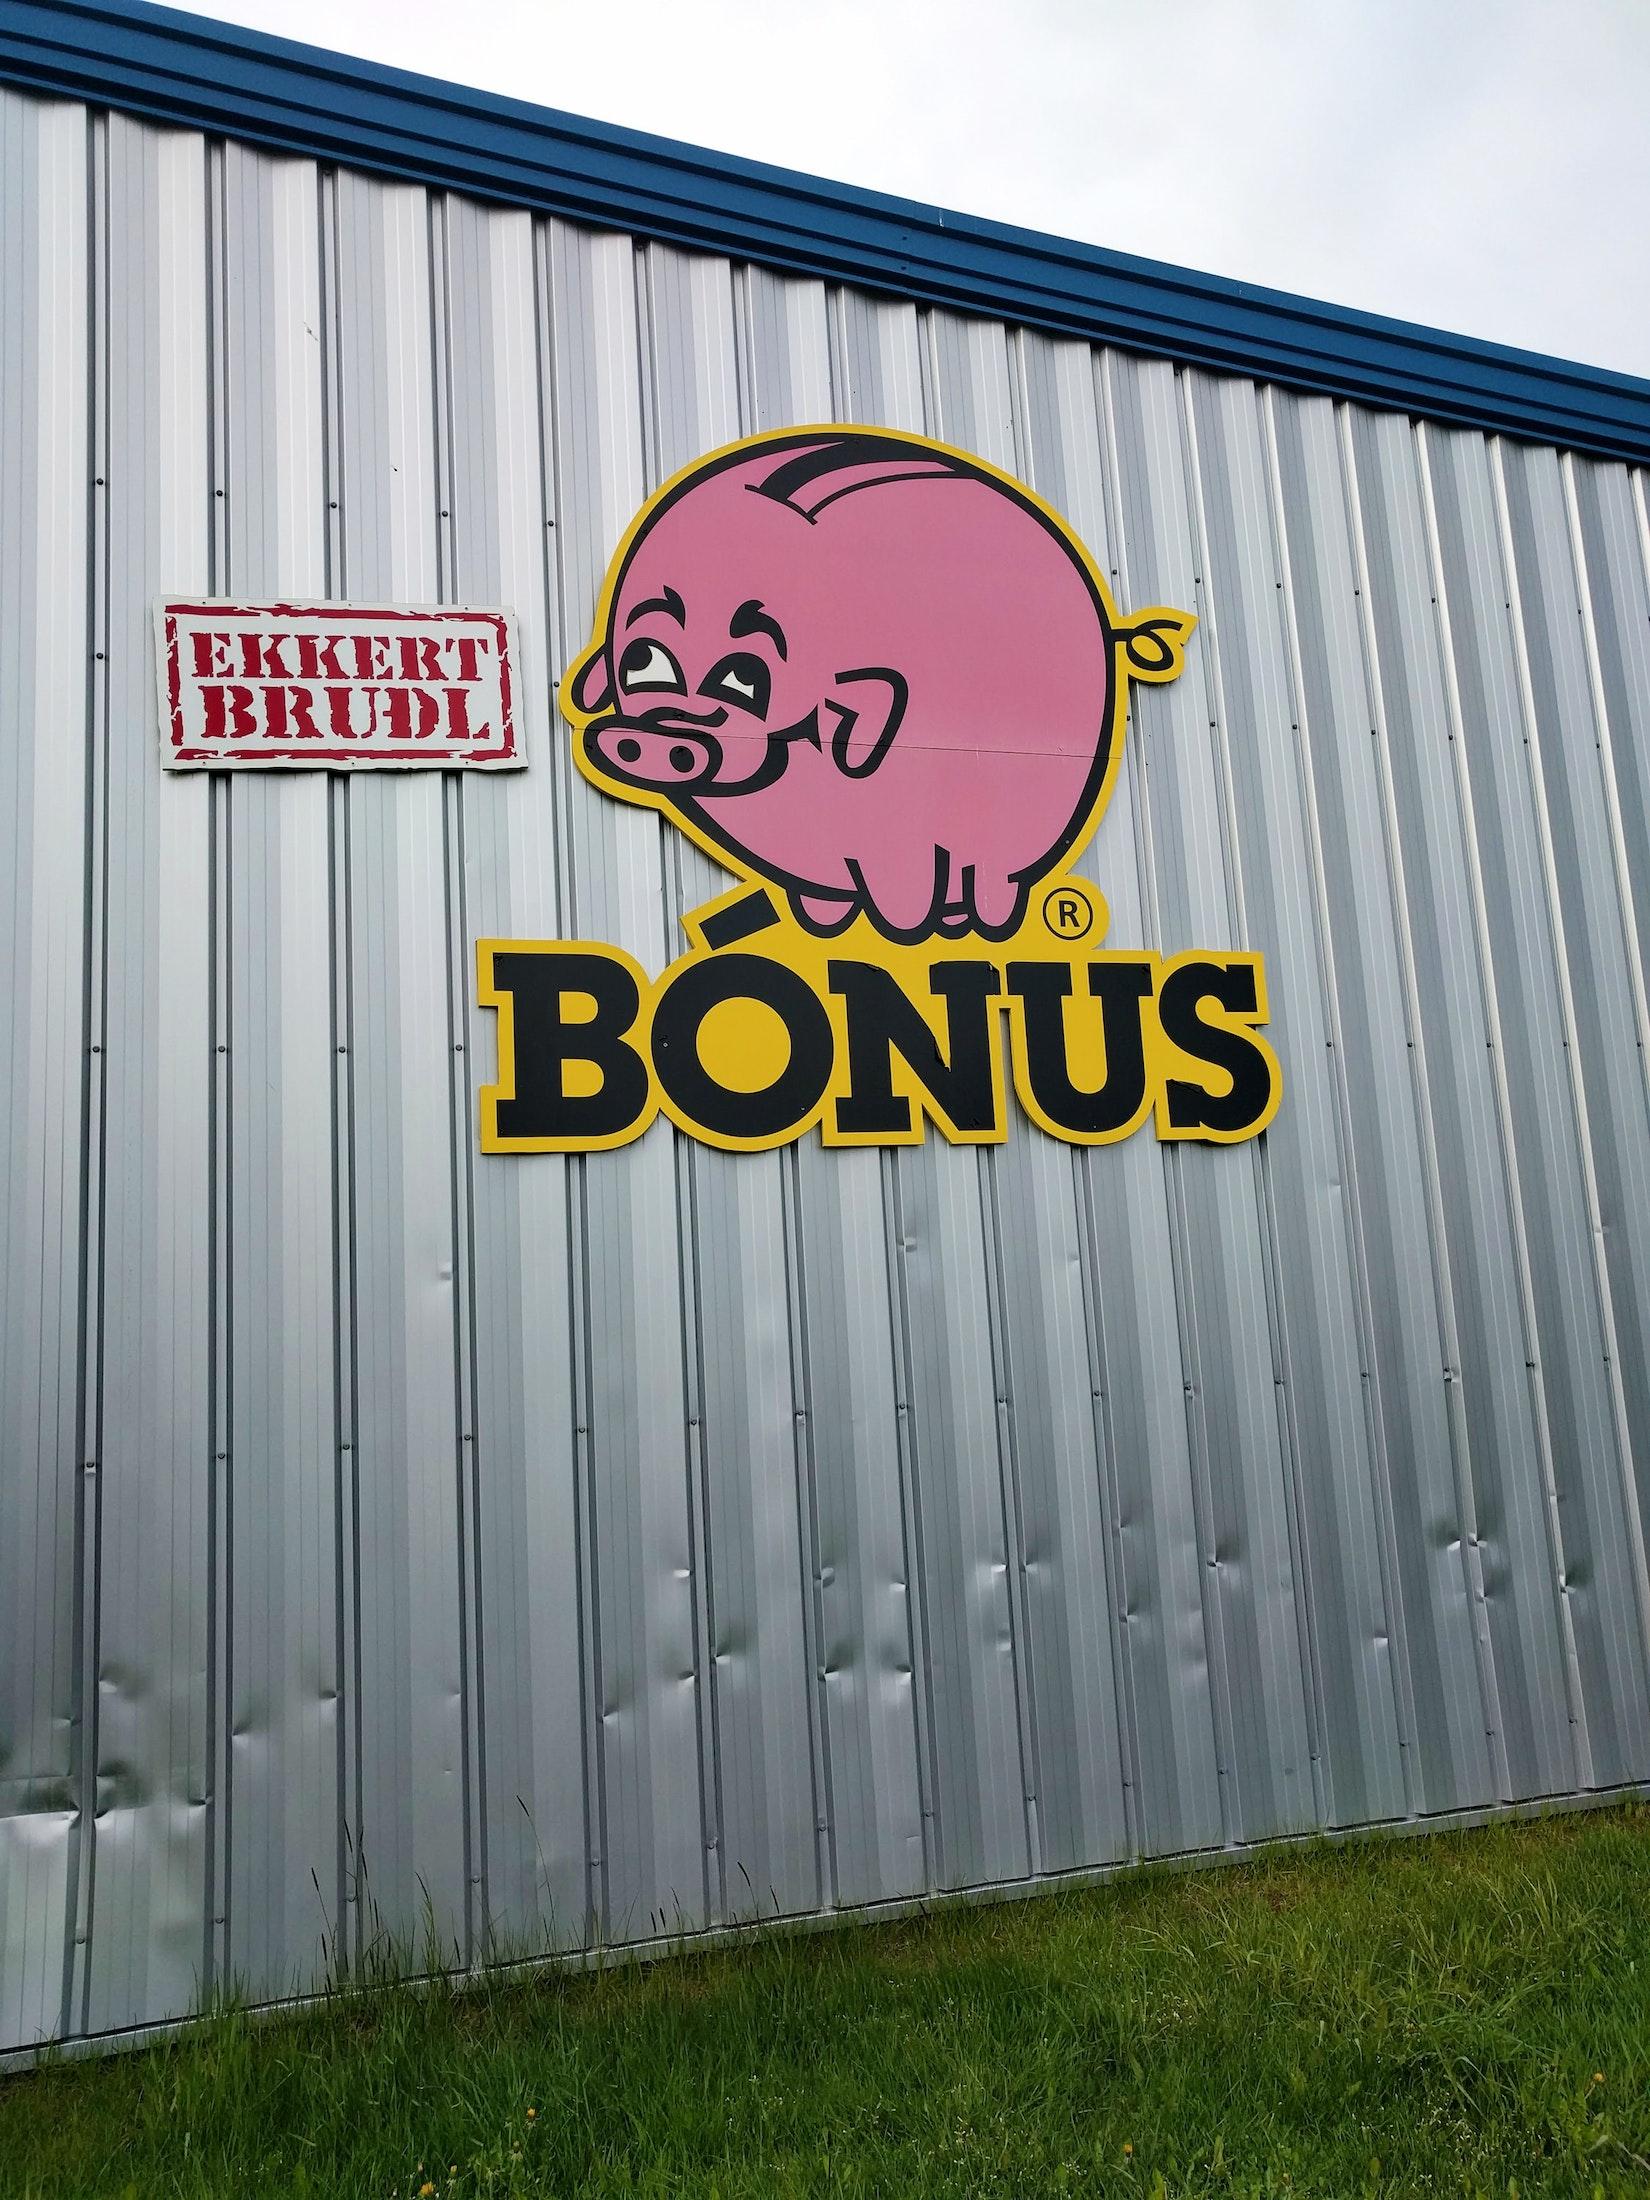 The Bonus Grocery Store Pig